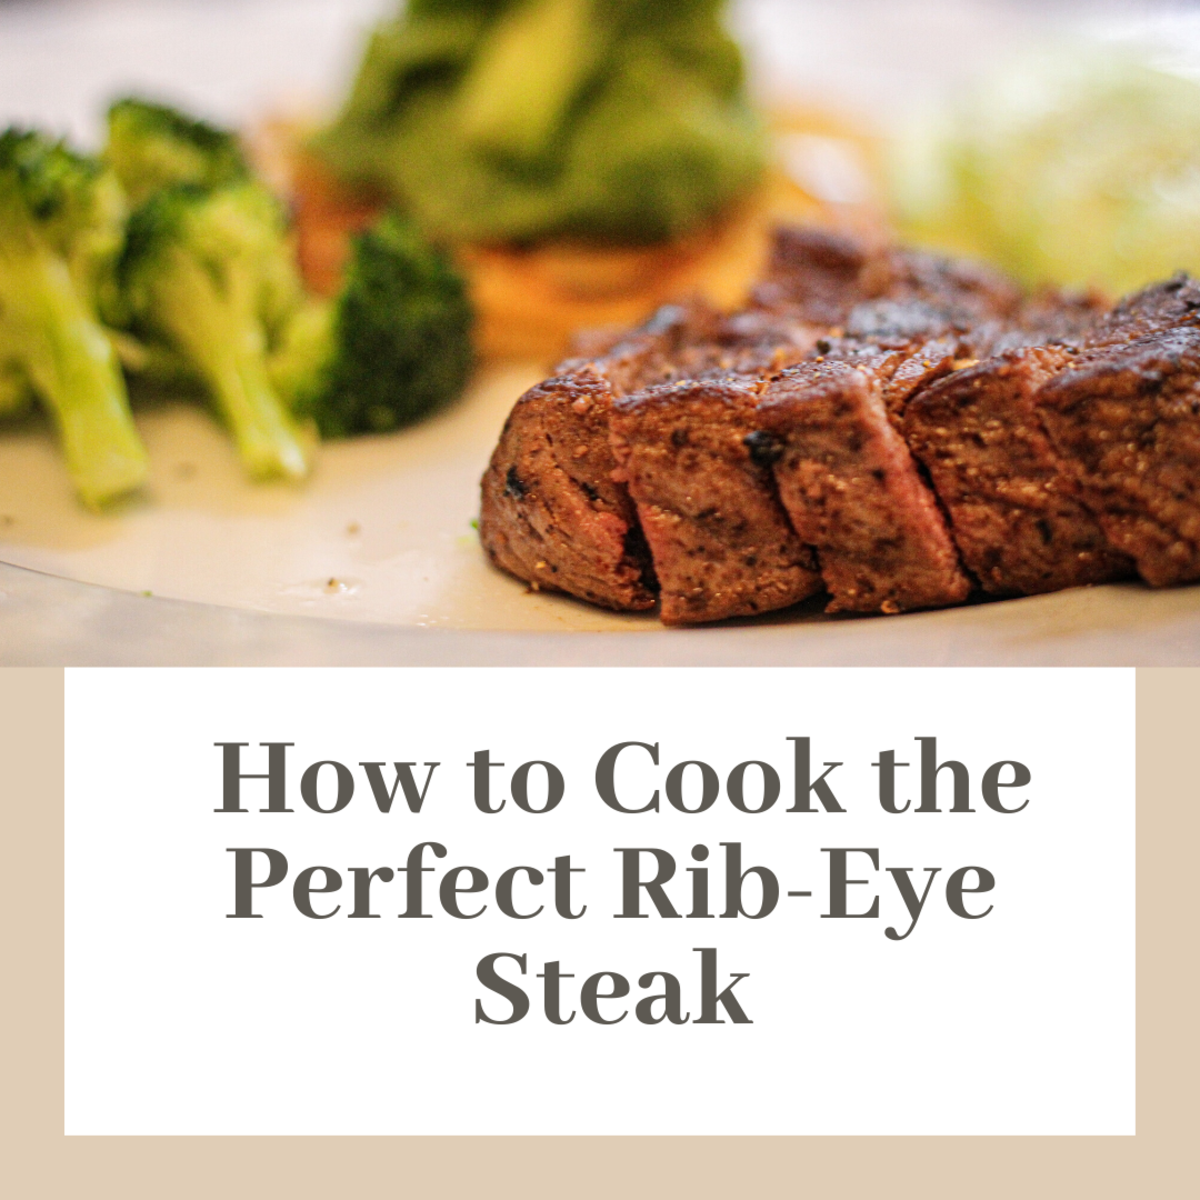 How to Cook the Perfect Rib-Eye Steak